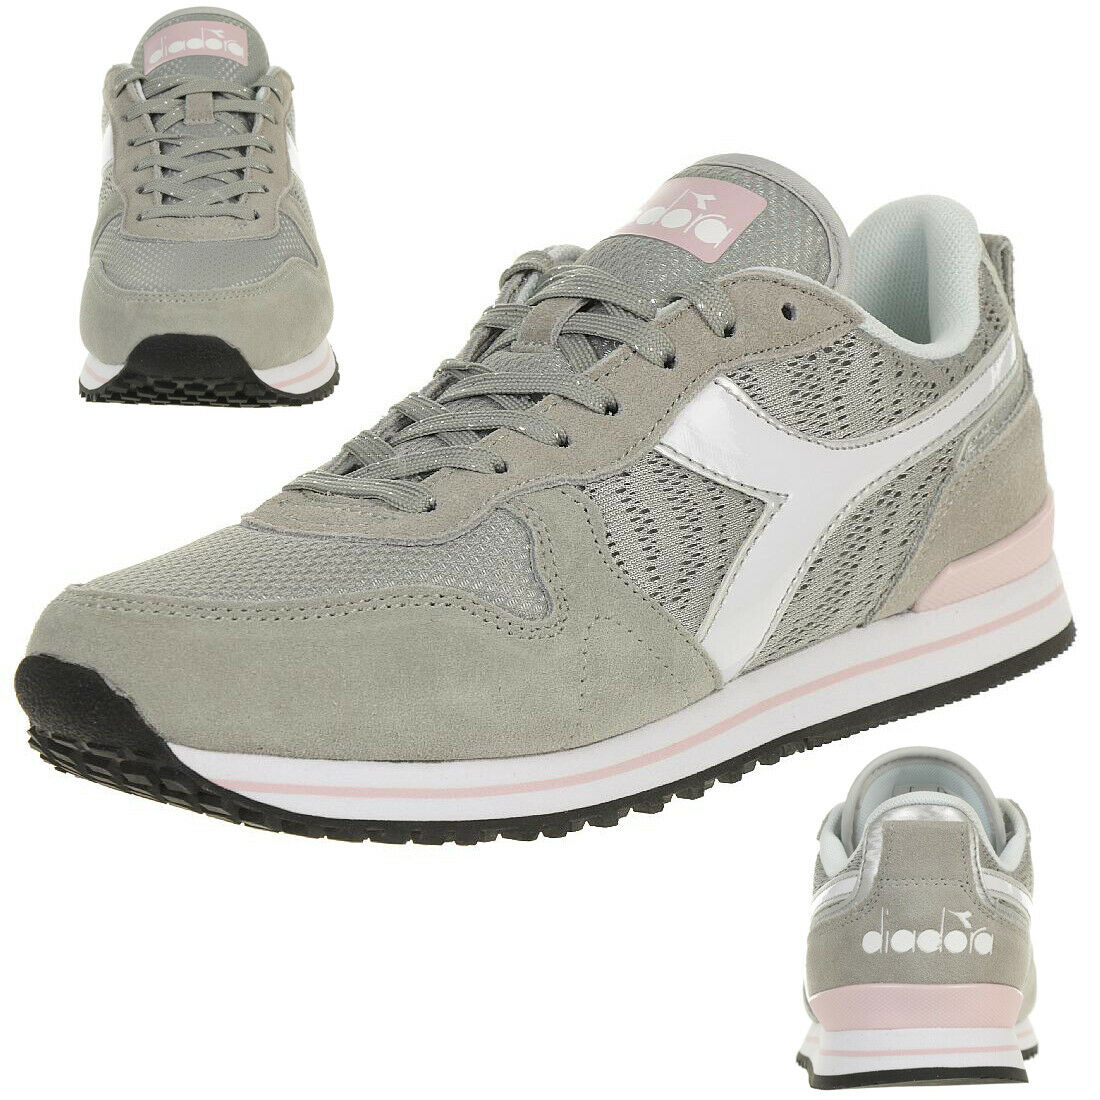 Diadora Olympia Wn Plat Women's Sneakers Trainers Grey